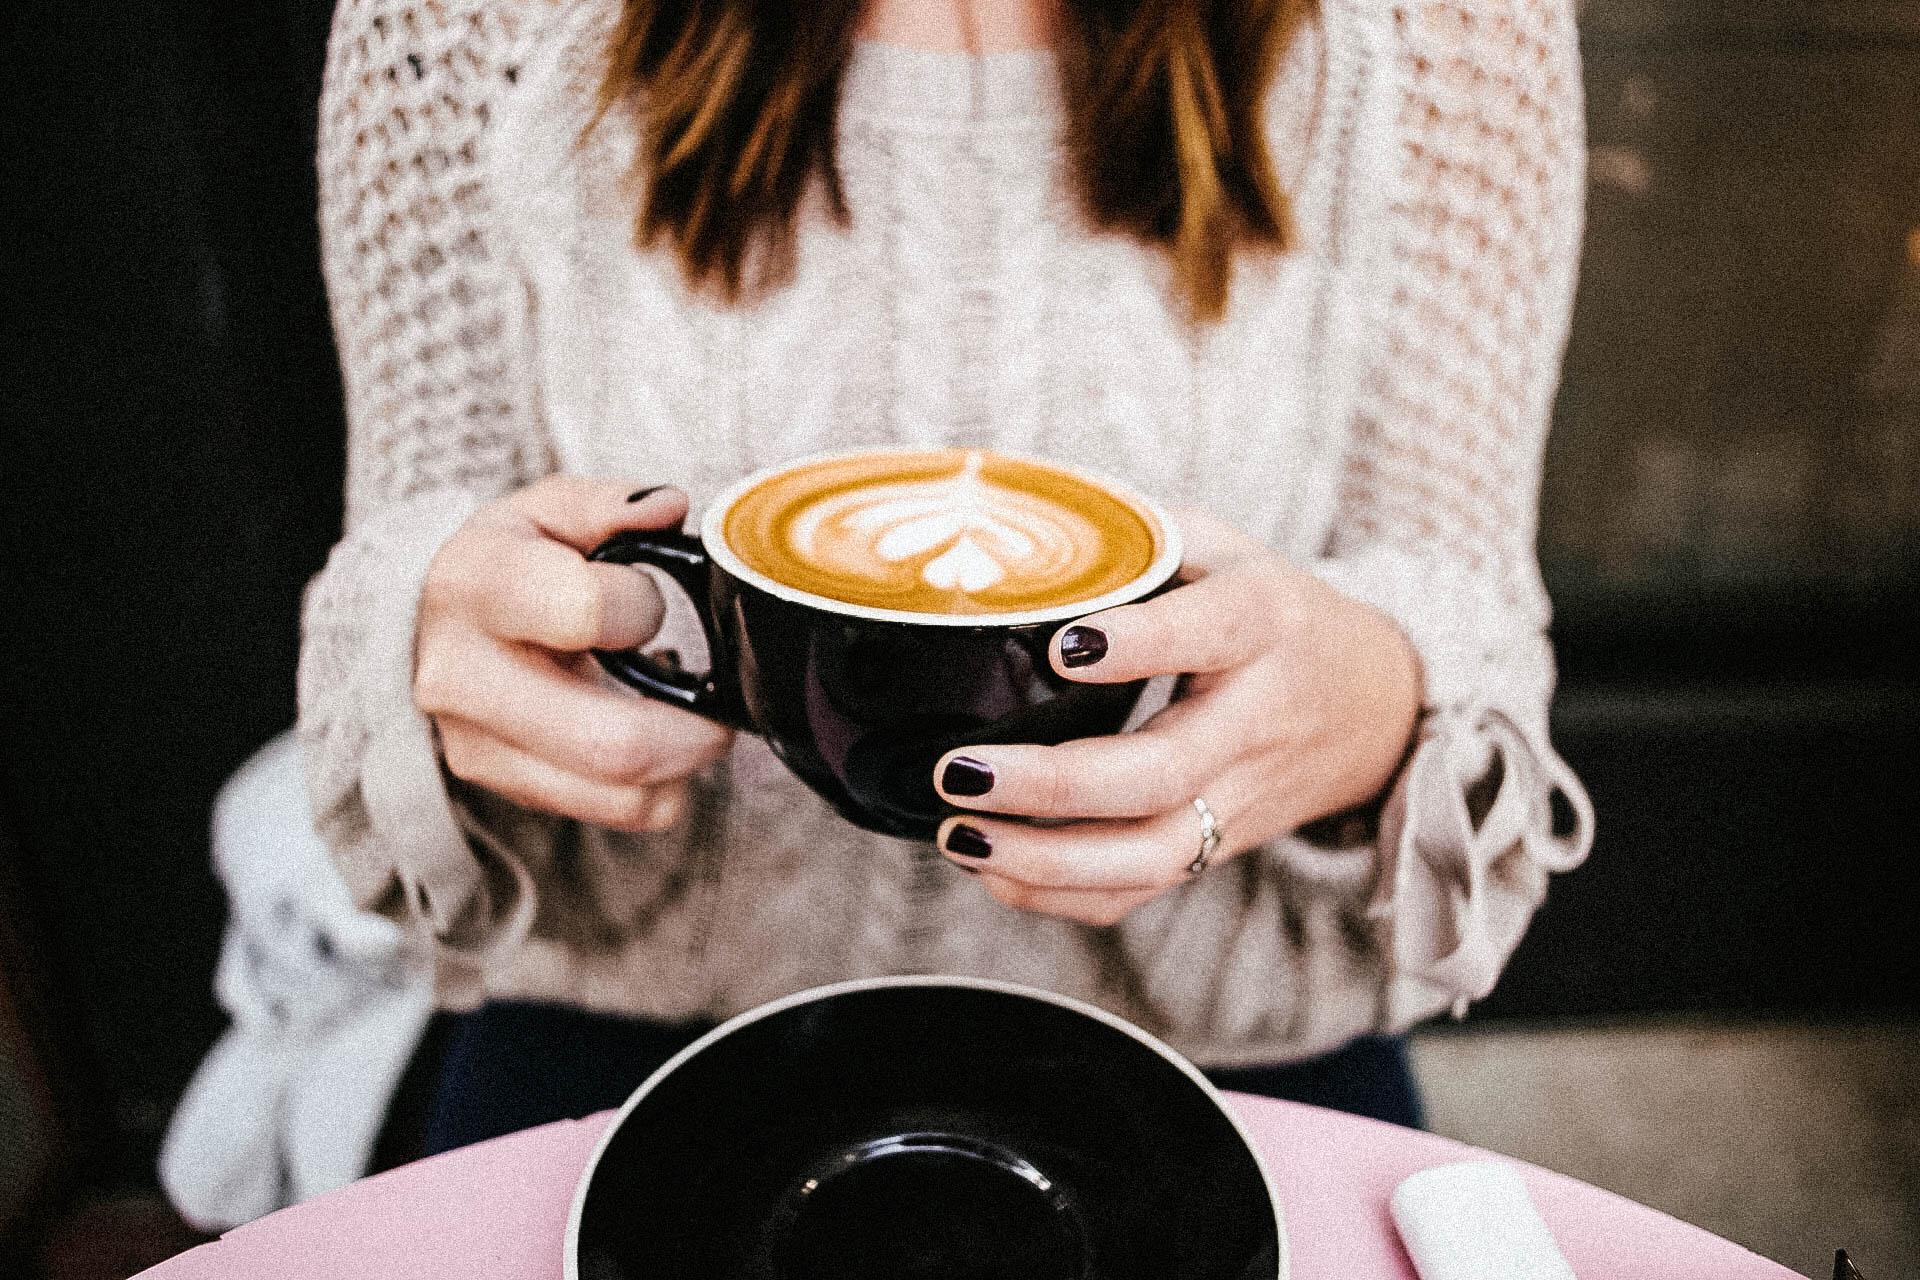 Emily-Coat-and-Coffee.jpg